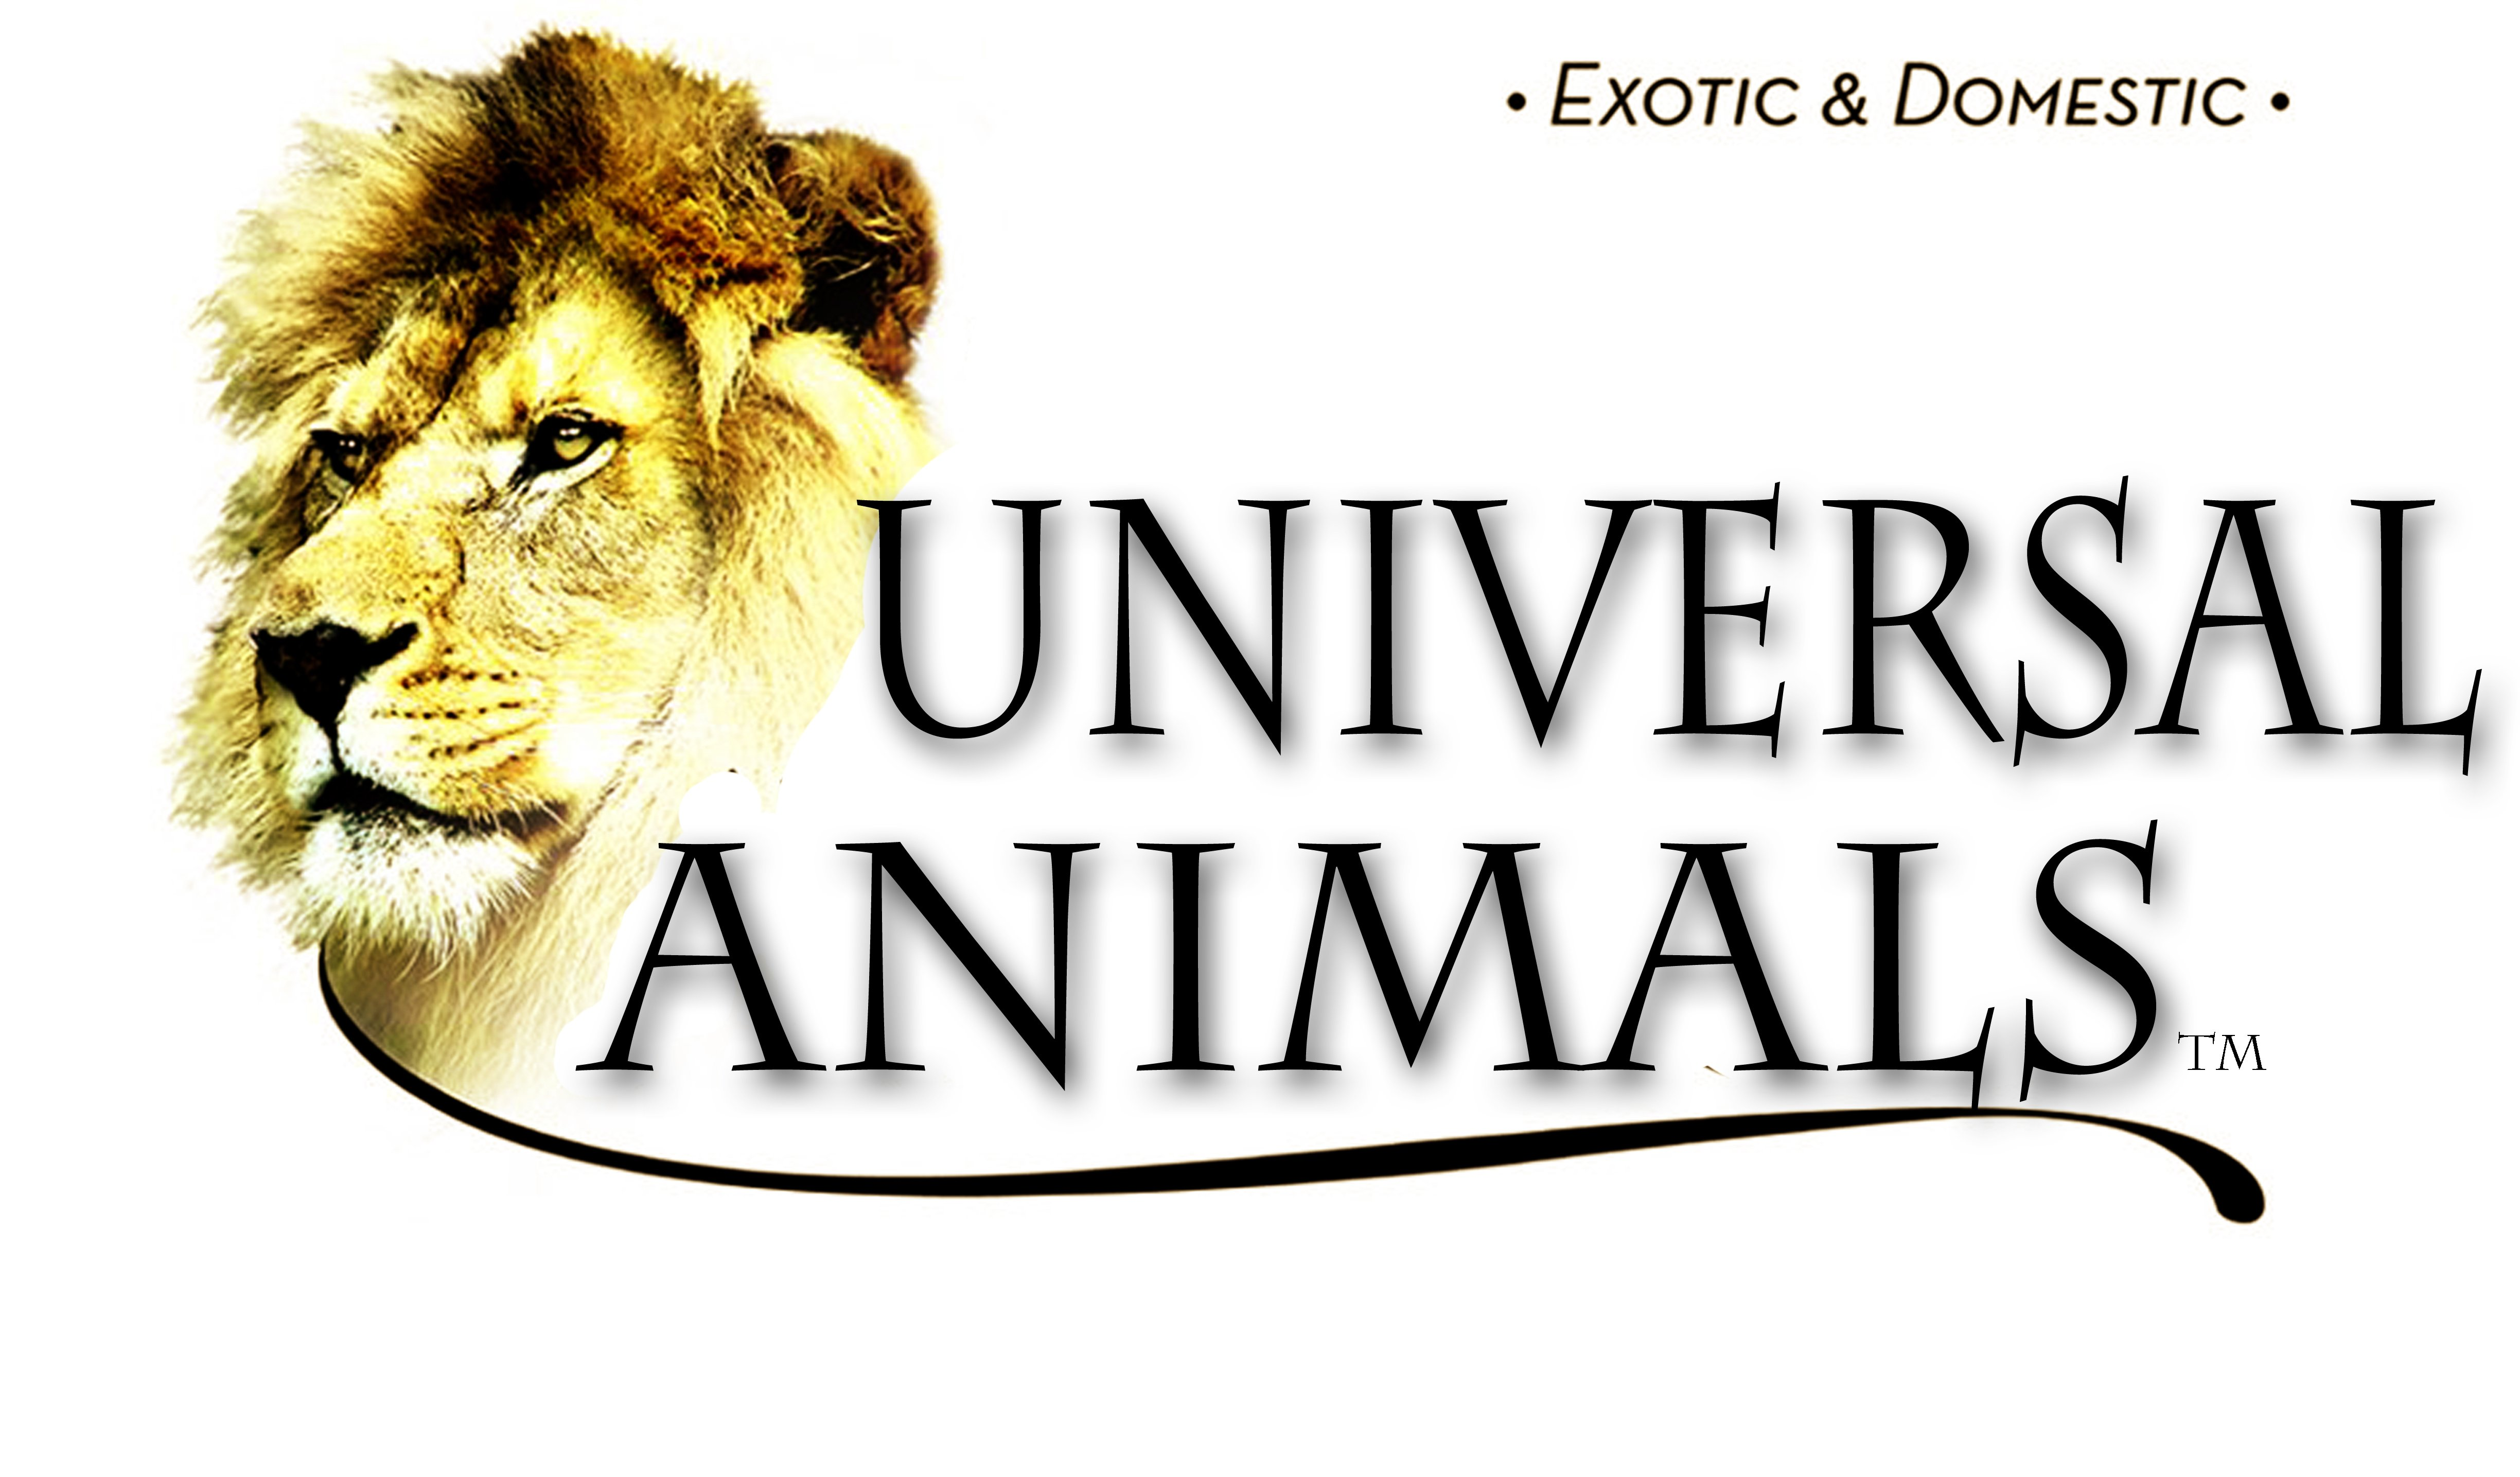 Universal Animals